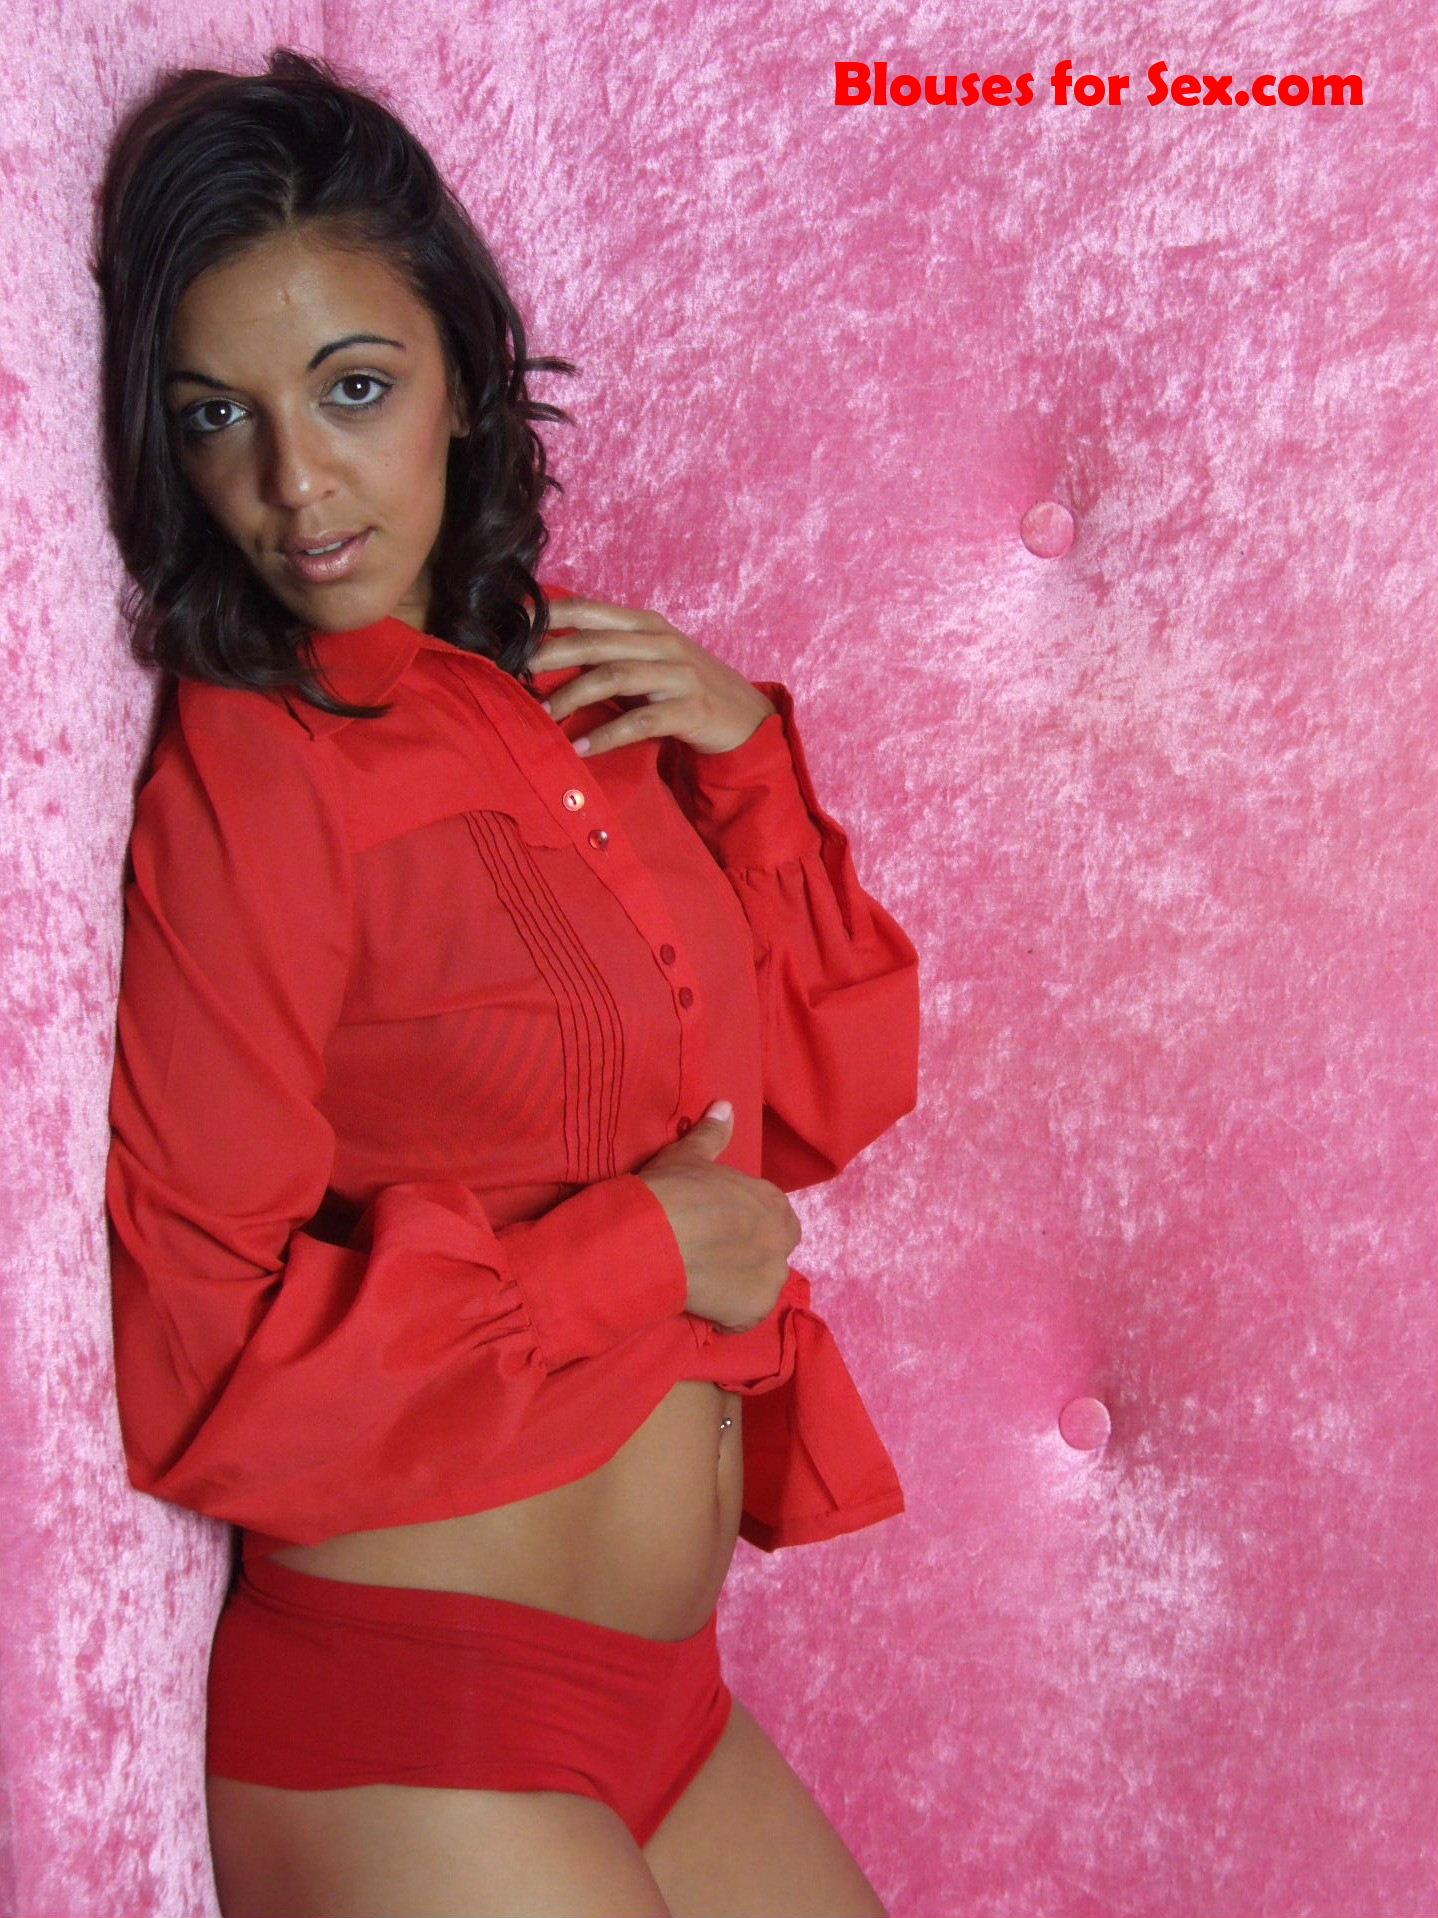 Red Blouse, Red Panties